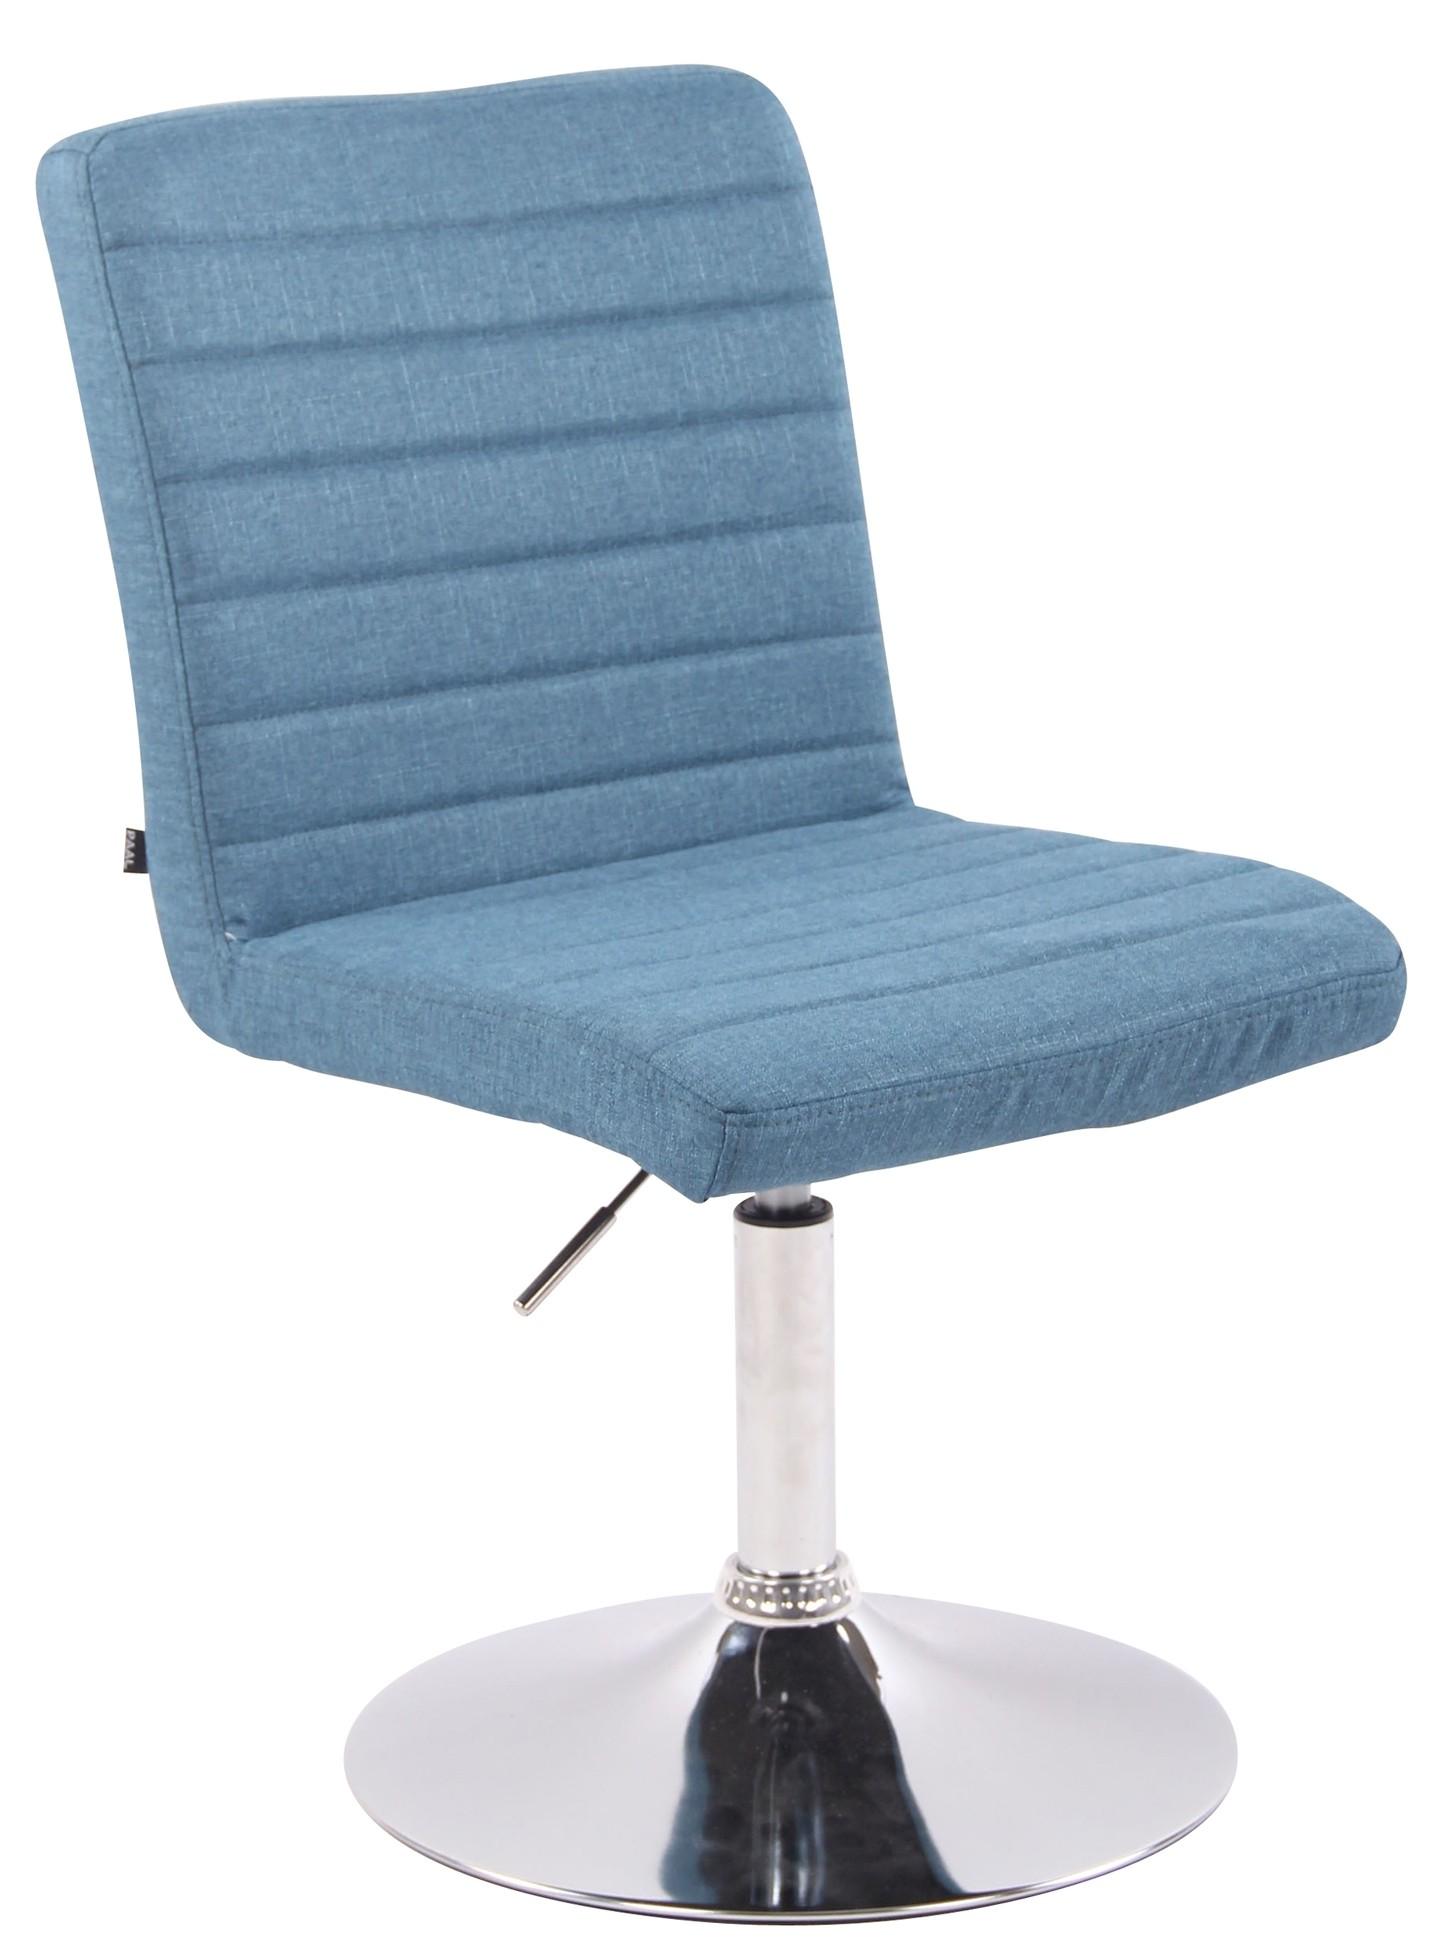 Chaise de salle à manger Elva tissu